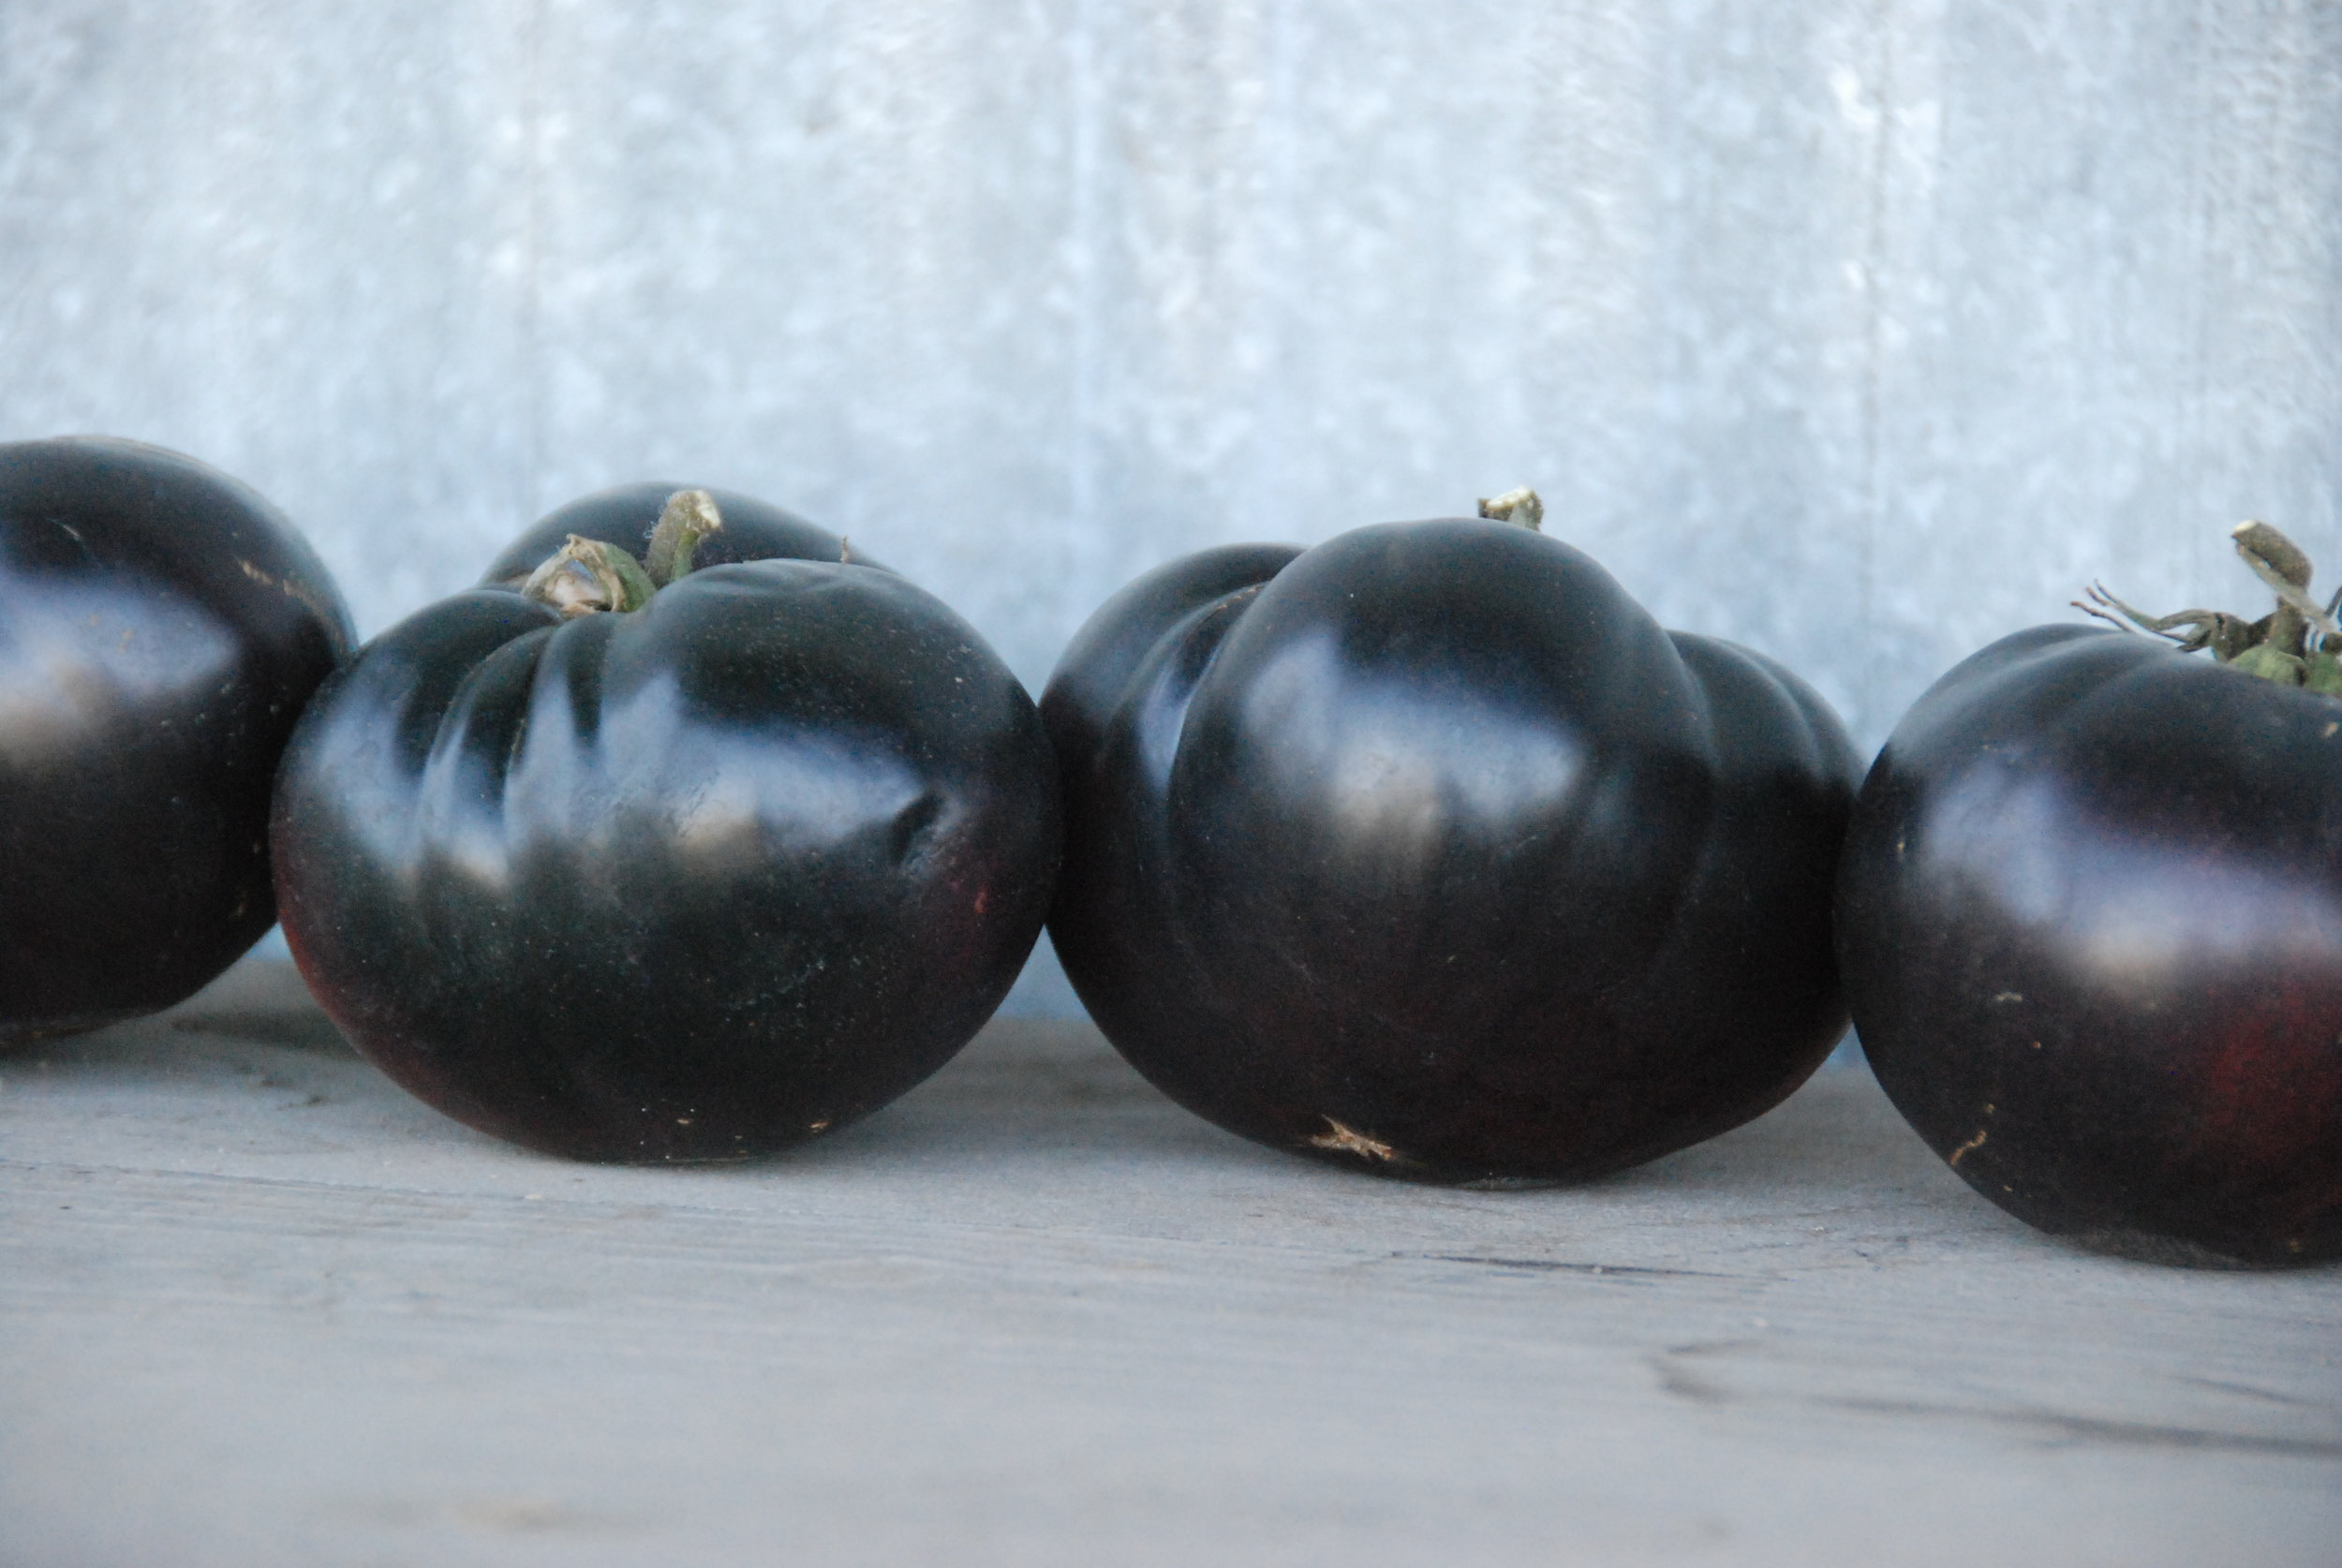 Black Beauty Tomatoes